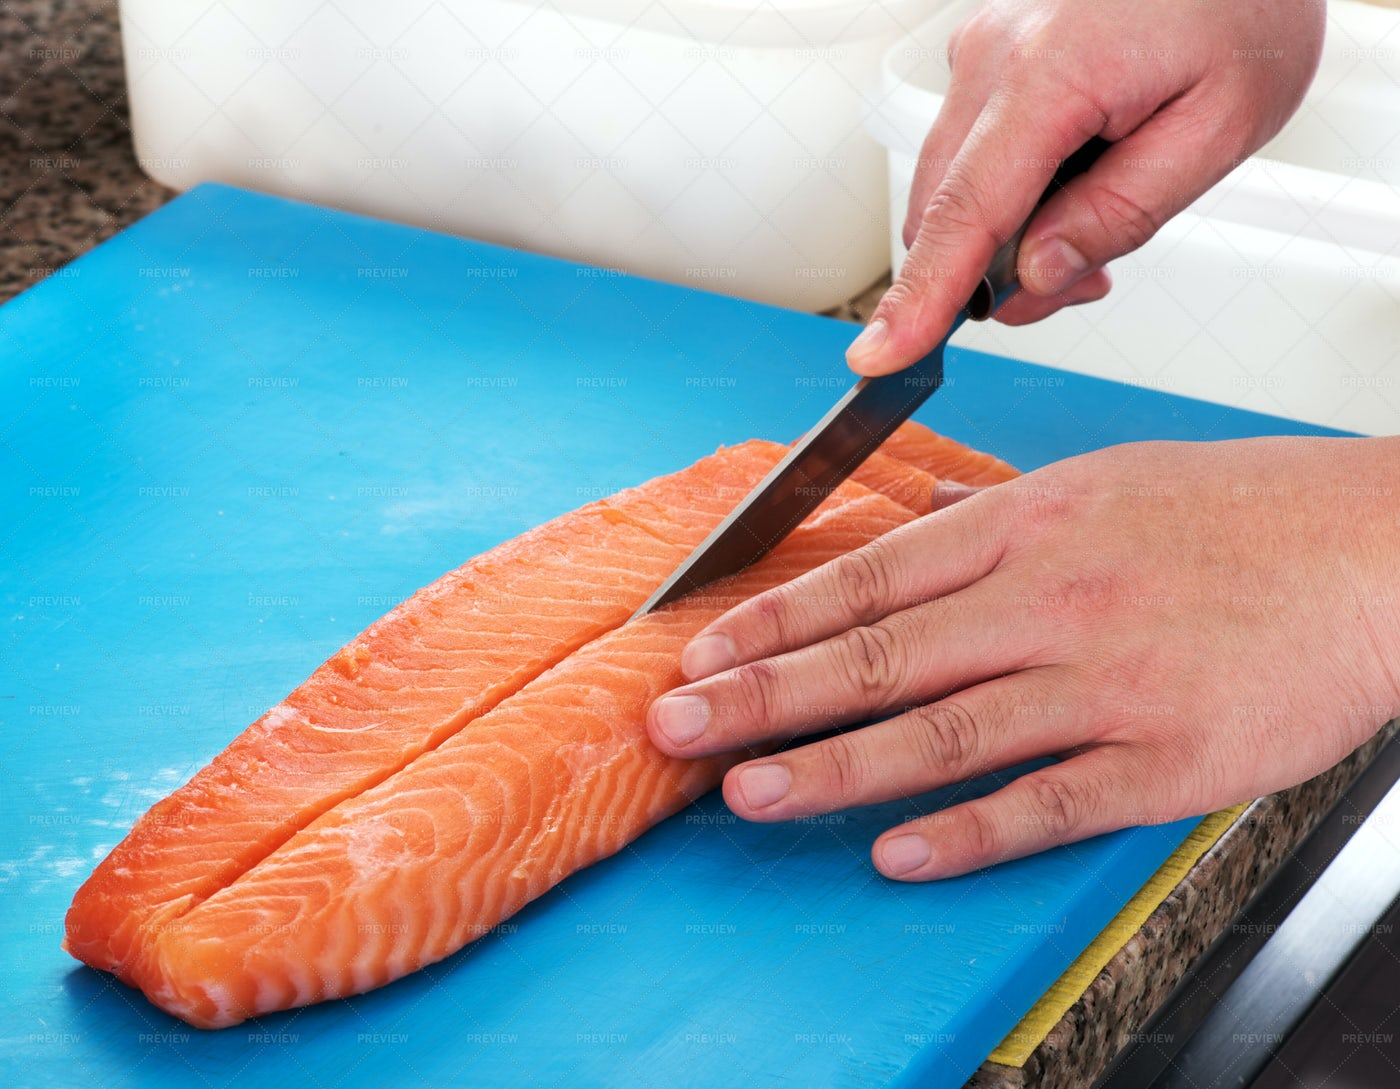 Chef Slicing Raw Salmon: Stock Photos